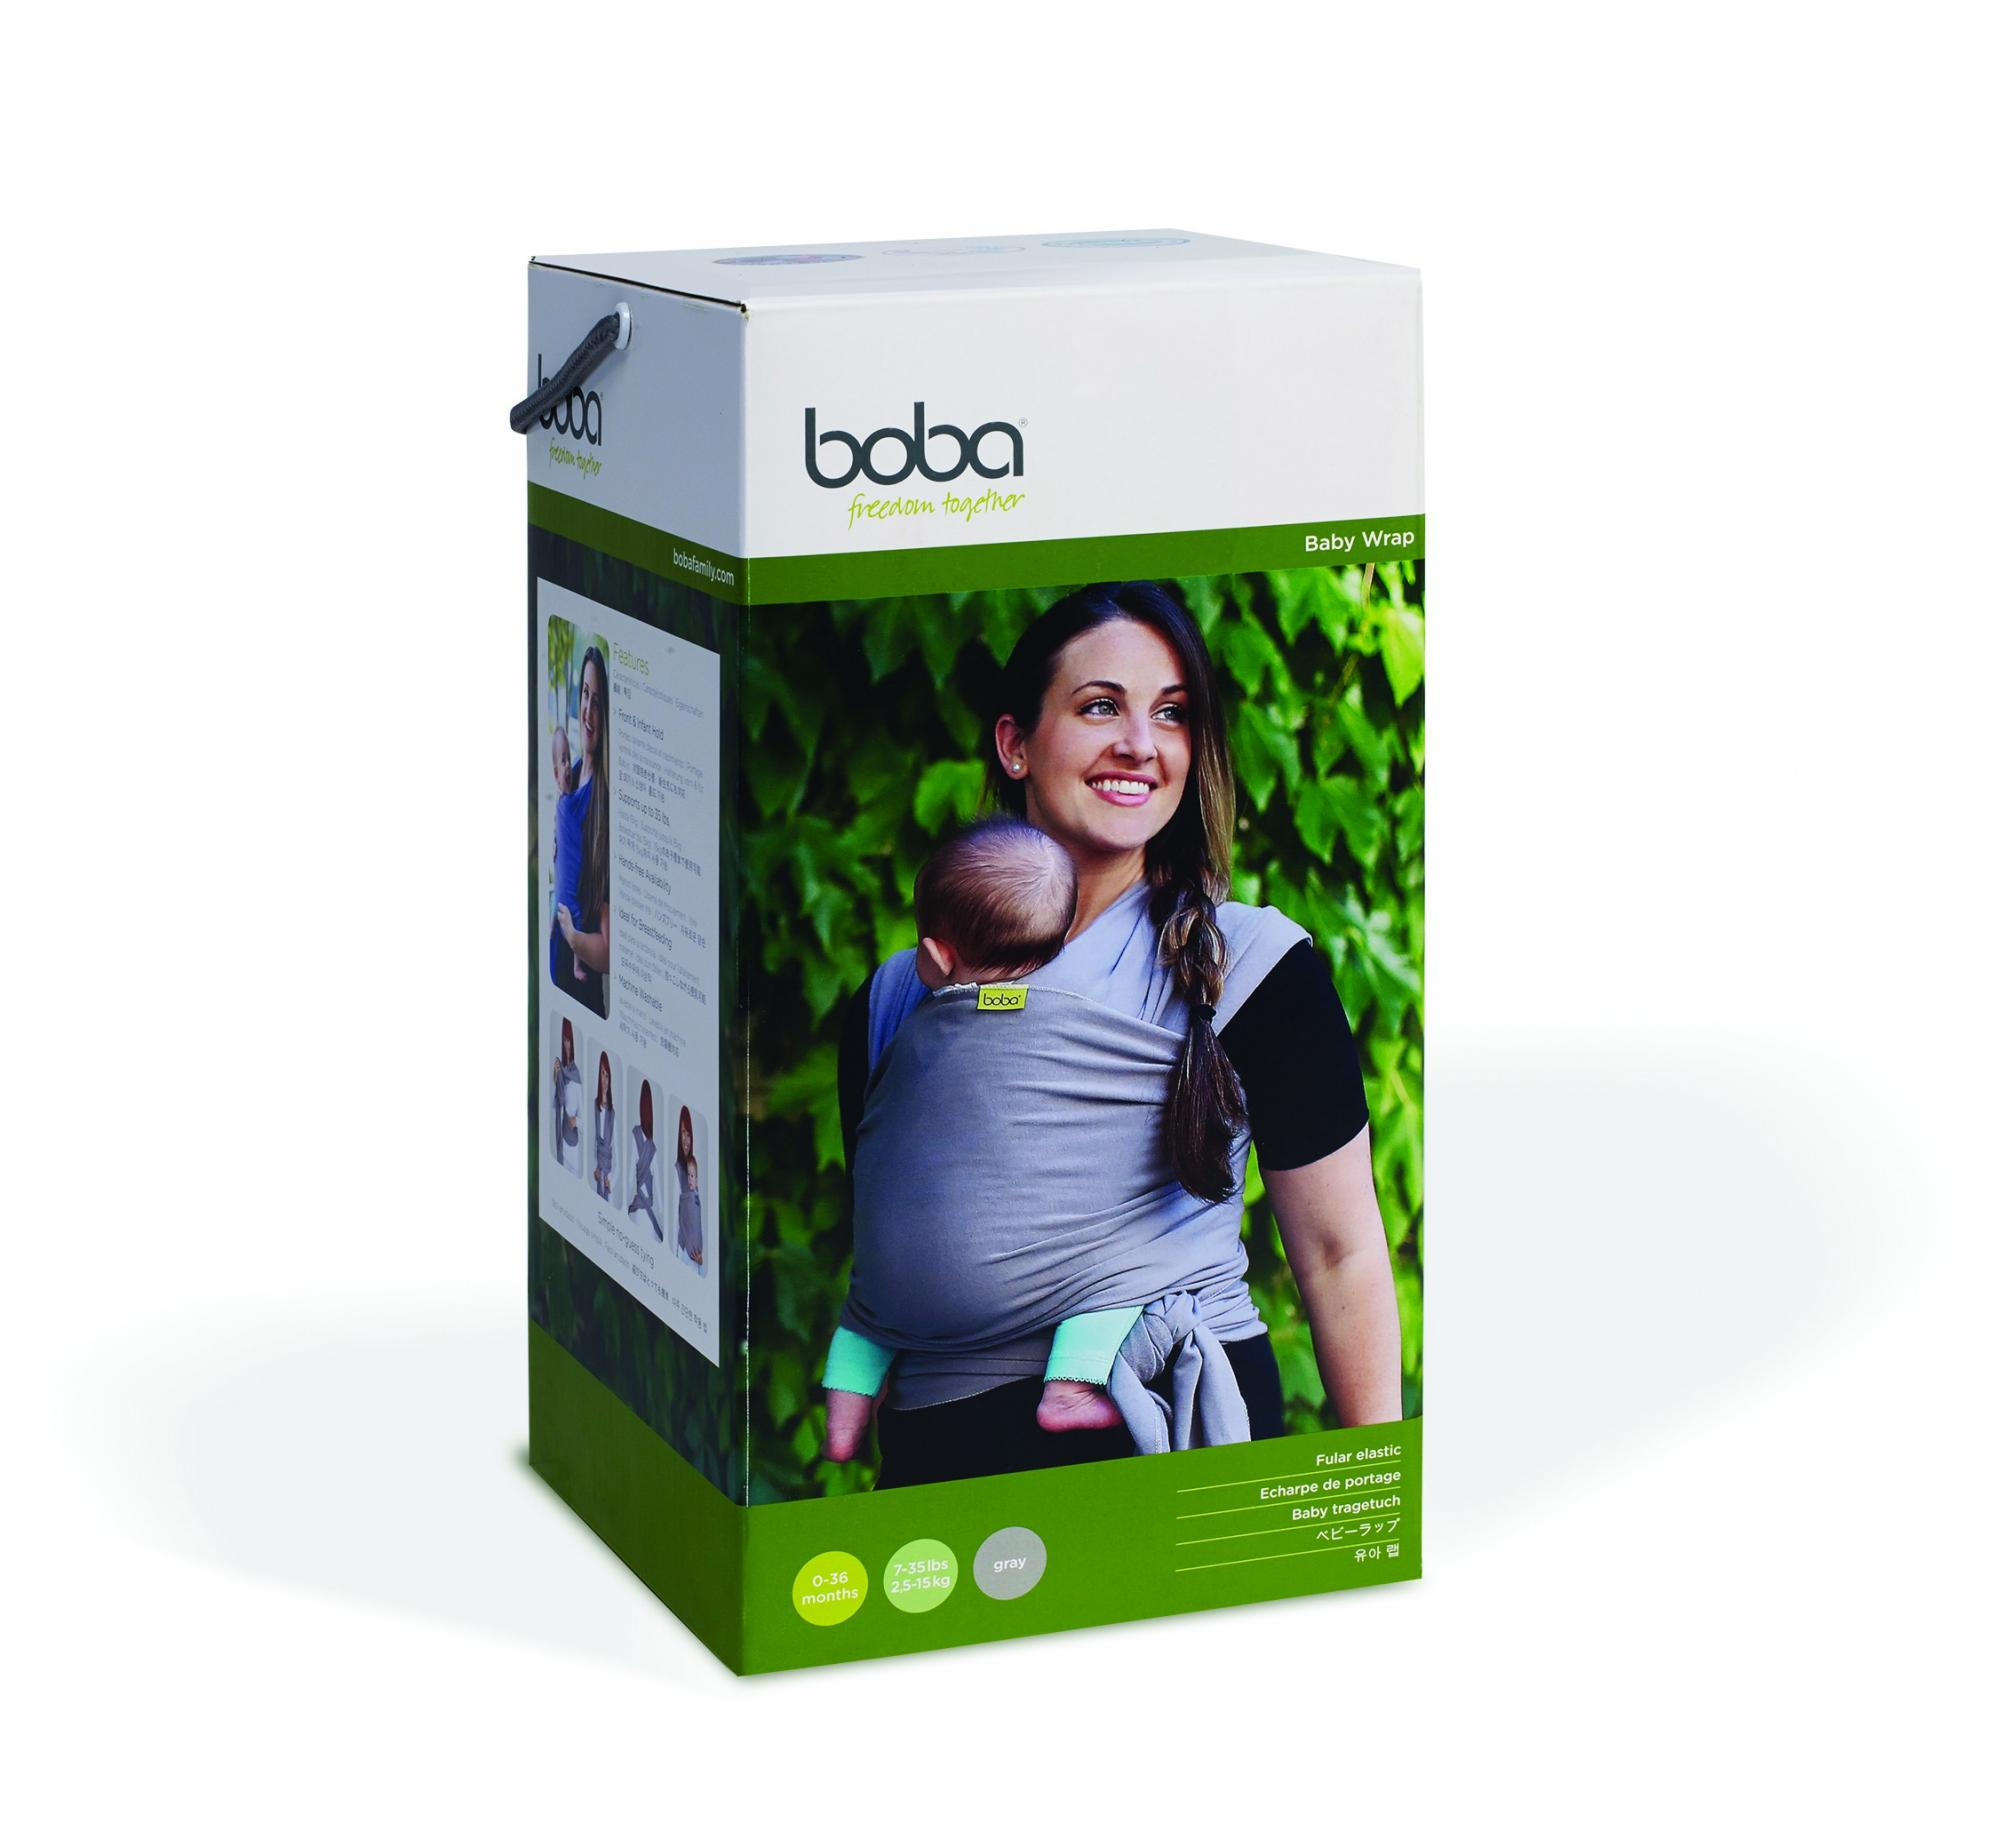 boba-wrap-baby-carrier-box.jpg